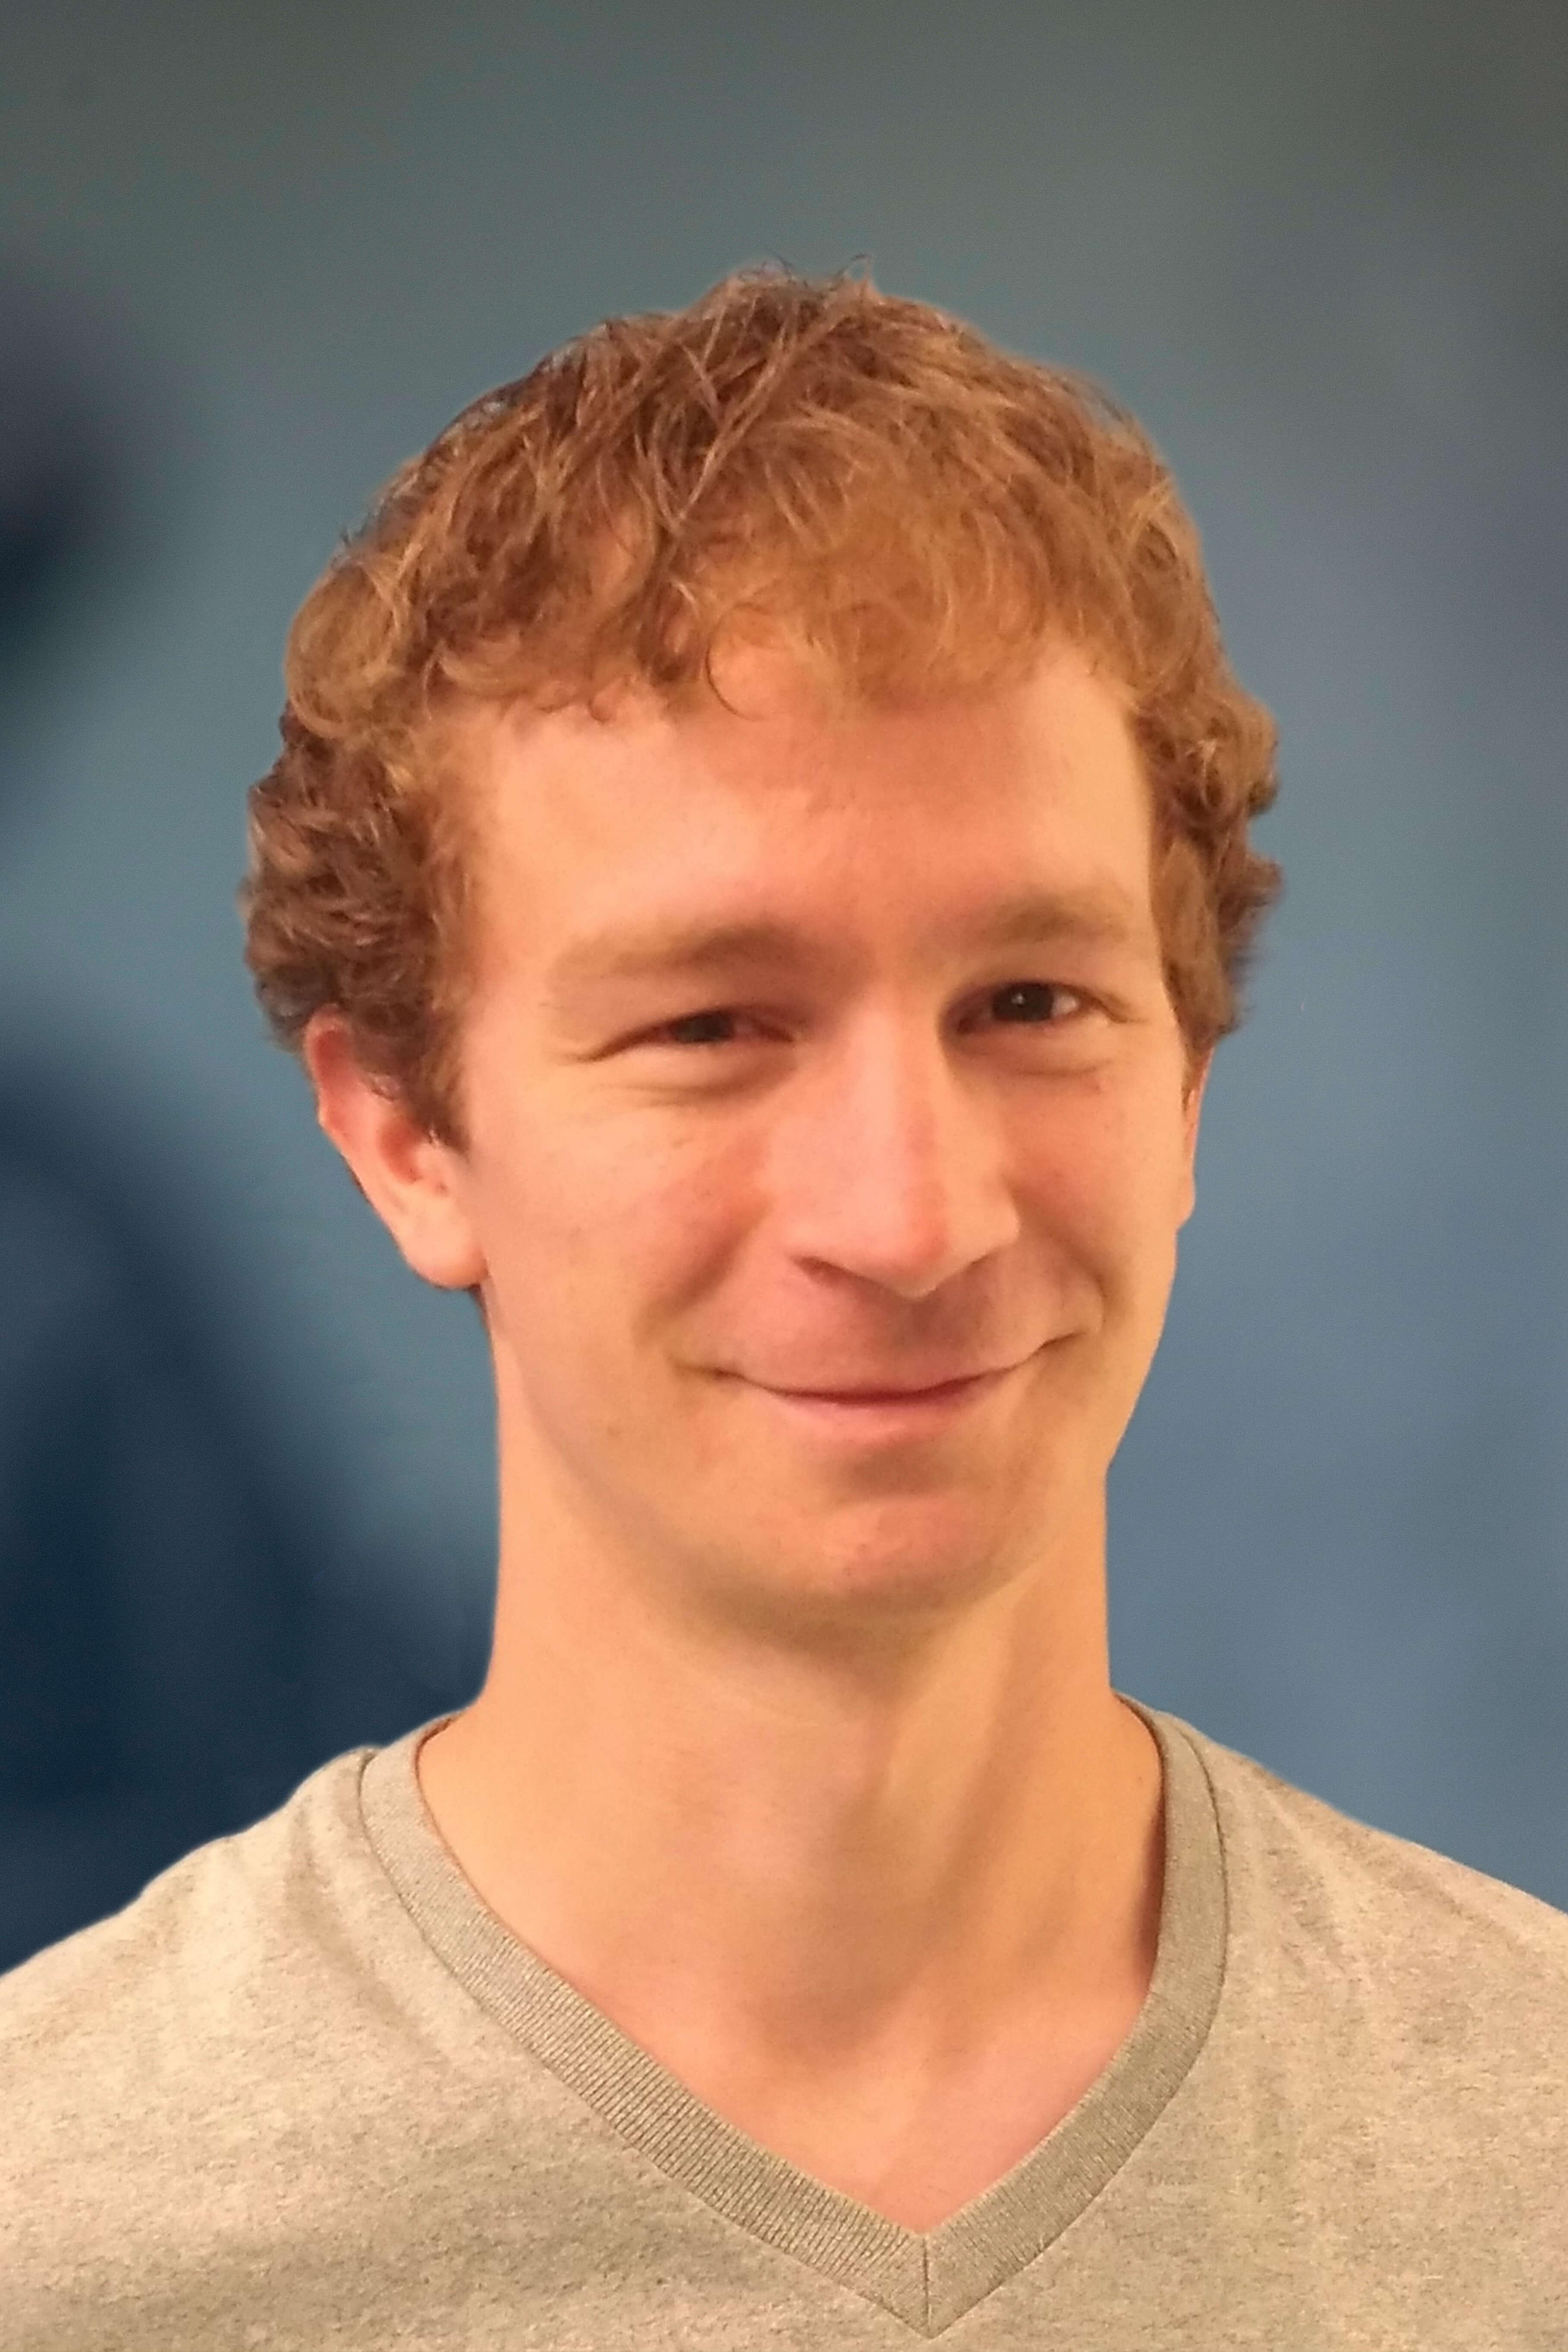 Nils Jongerius